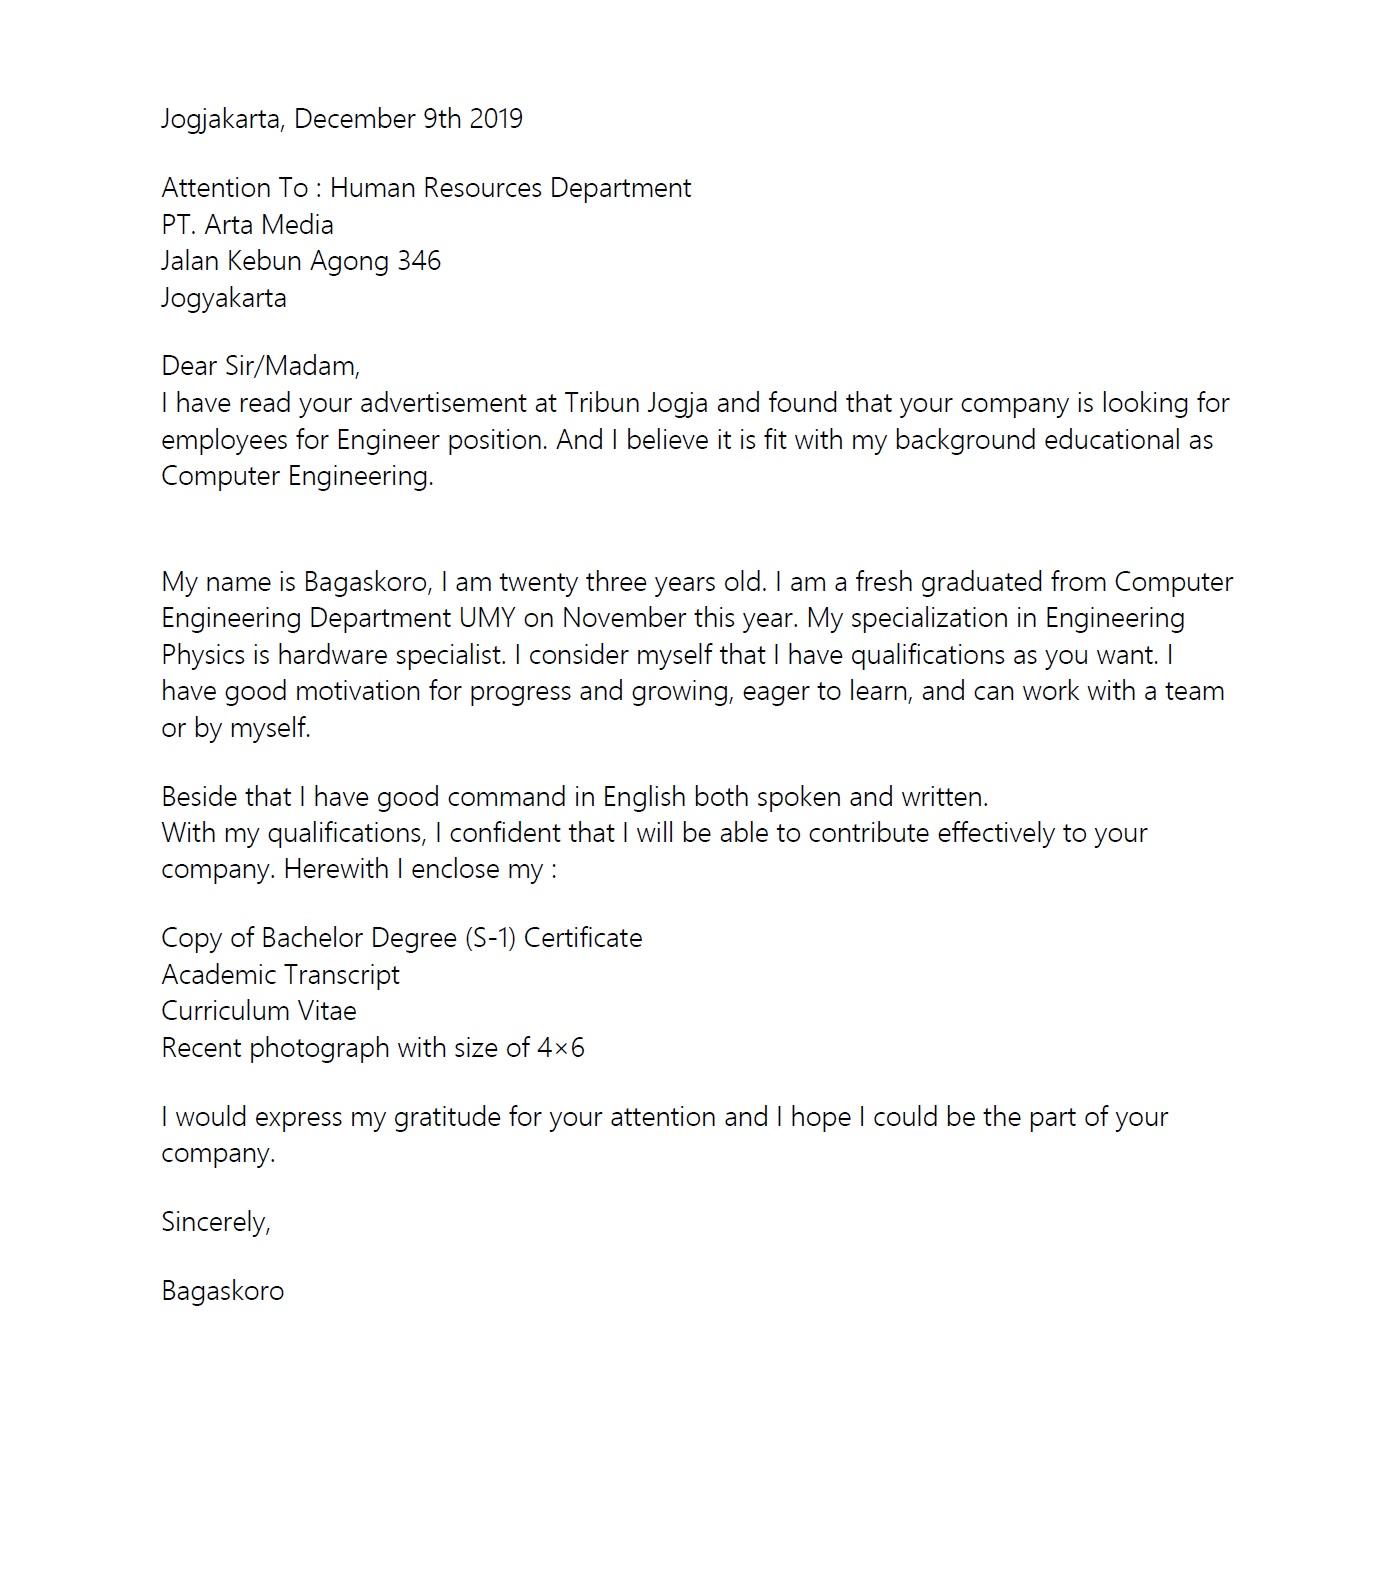 15 Contoh Surat Lamaran Kerja Bahasa Inggris Tulis Tangan Yang Baik Dan Benar Ruangguruku Com